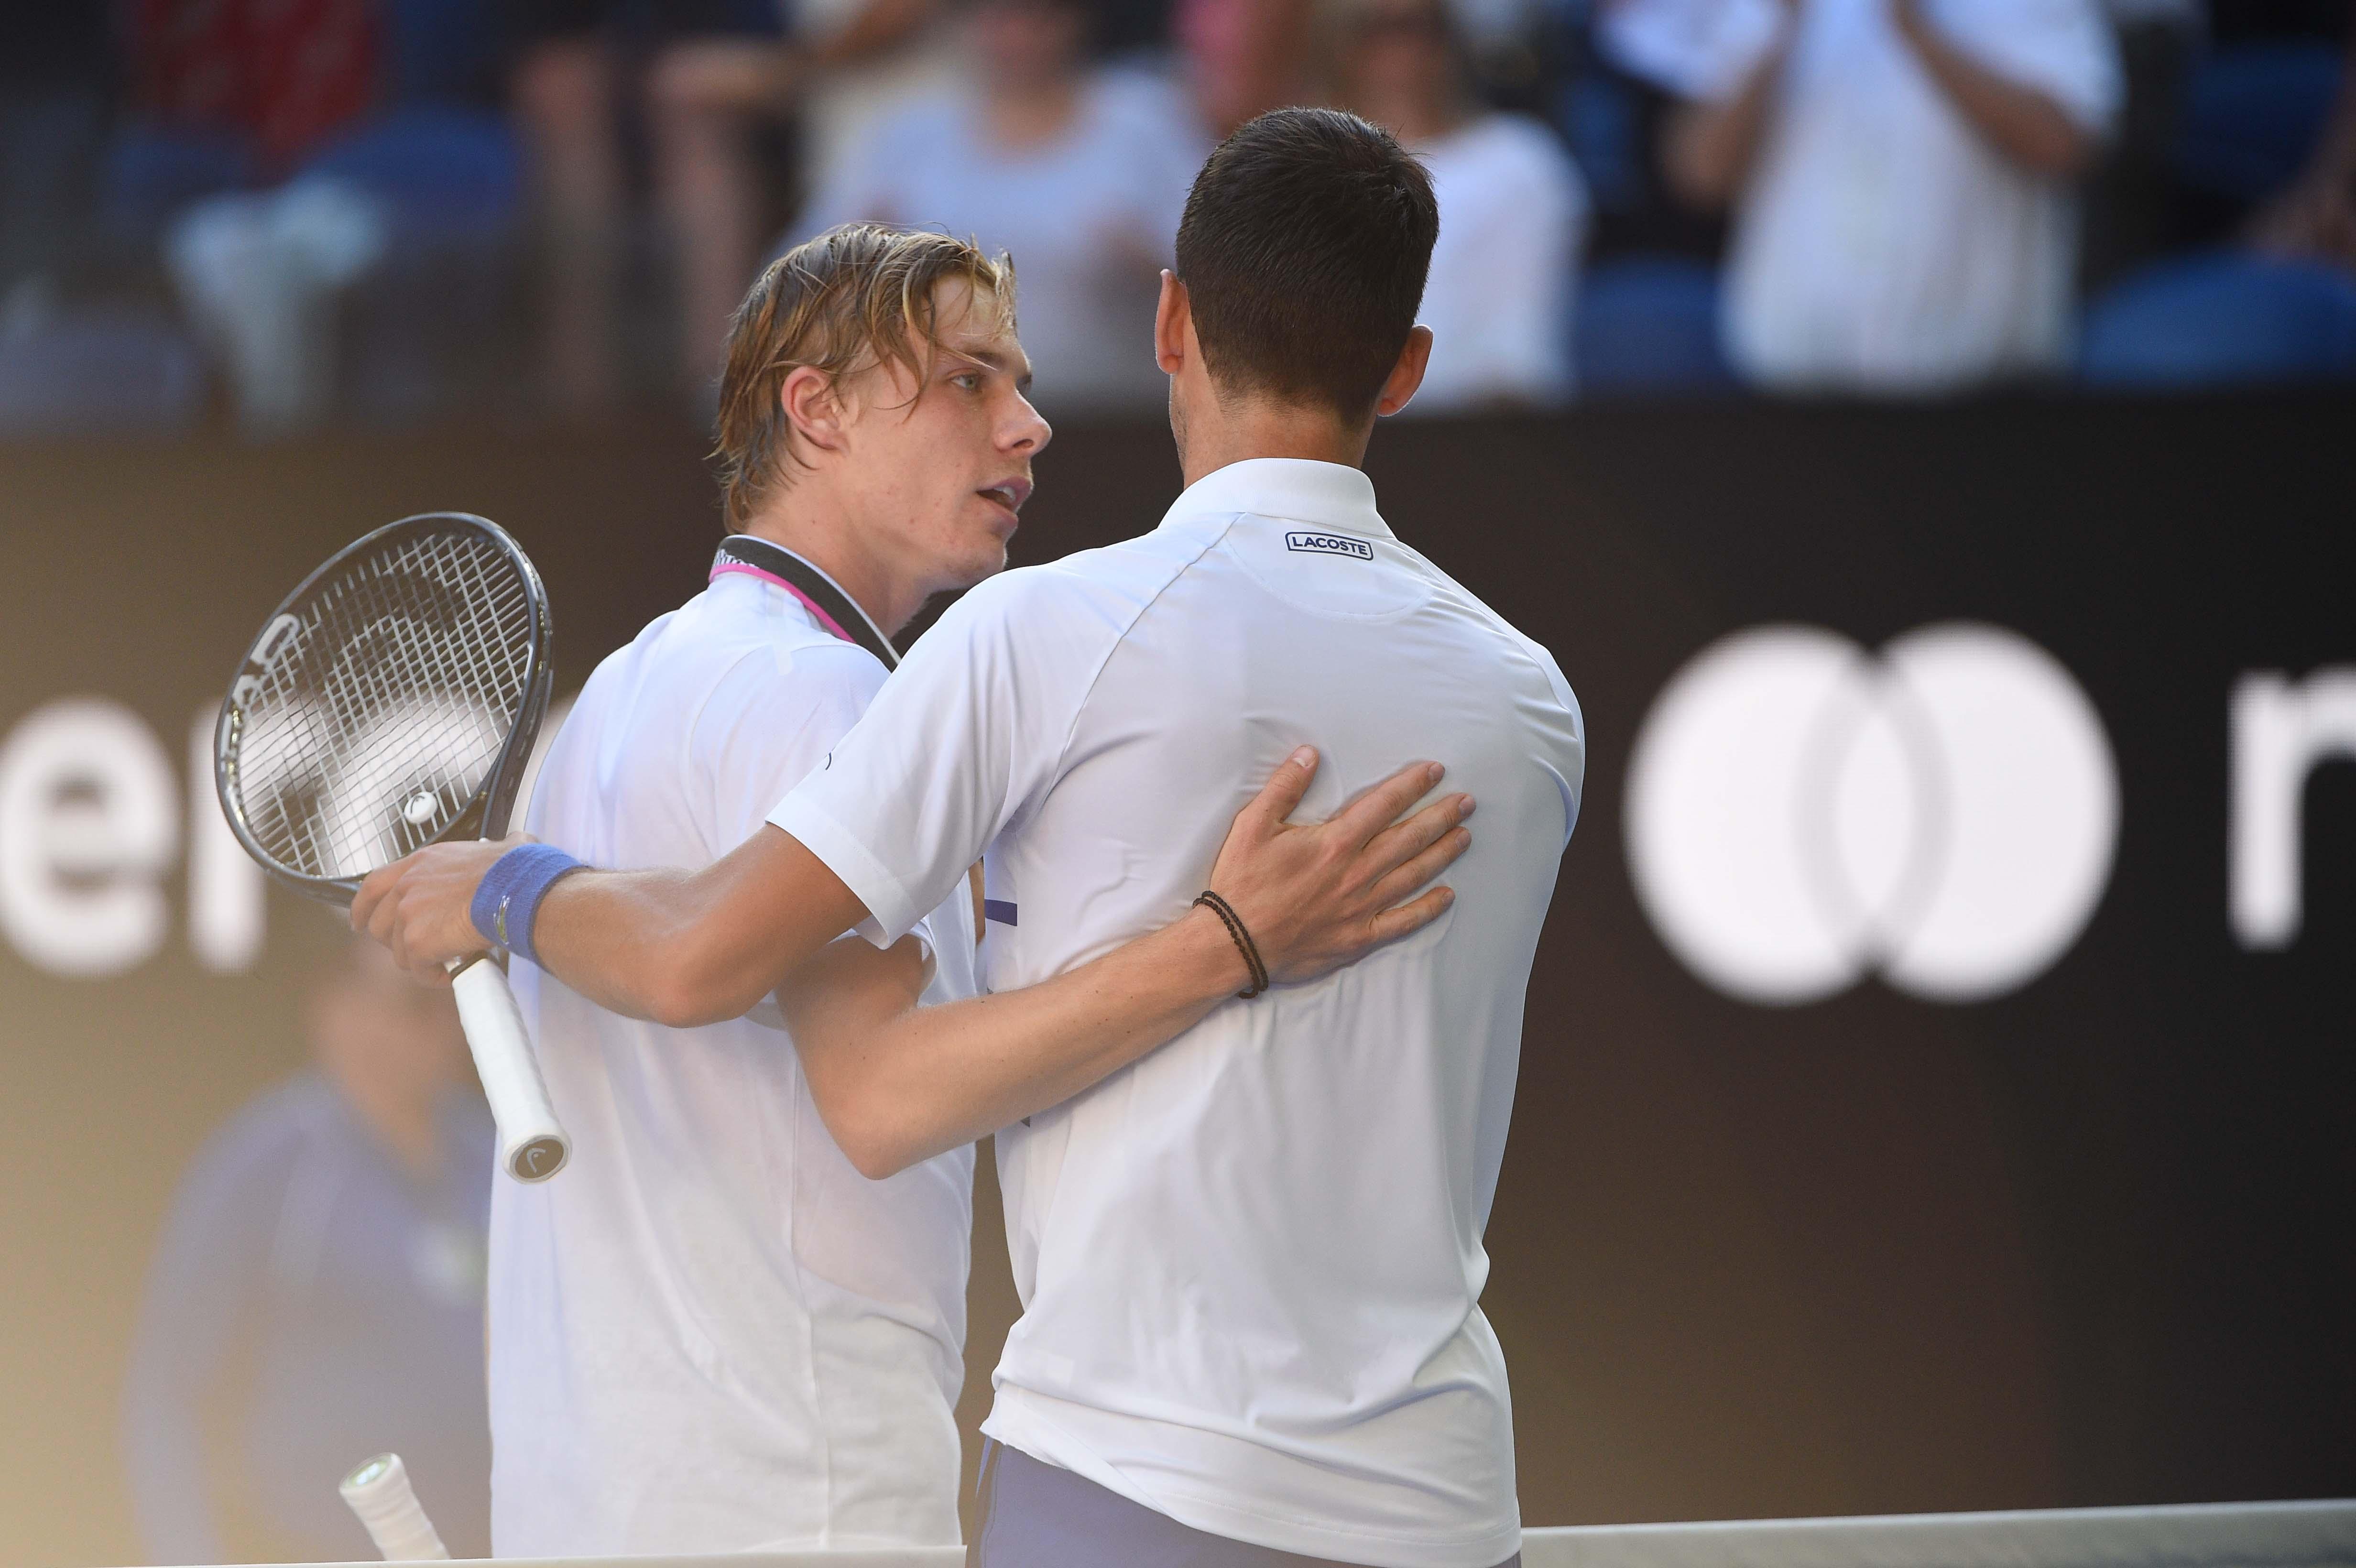 1c7e3ccbce6 Denis Shapovalov congratuling Novak Djokovic at the net during the Australian  Open 2019.